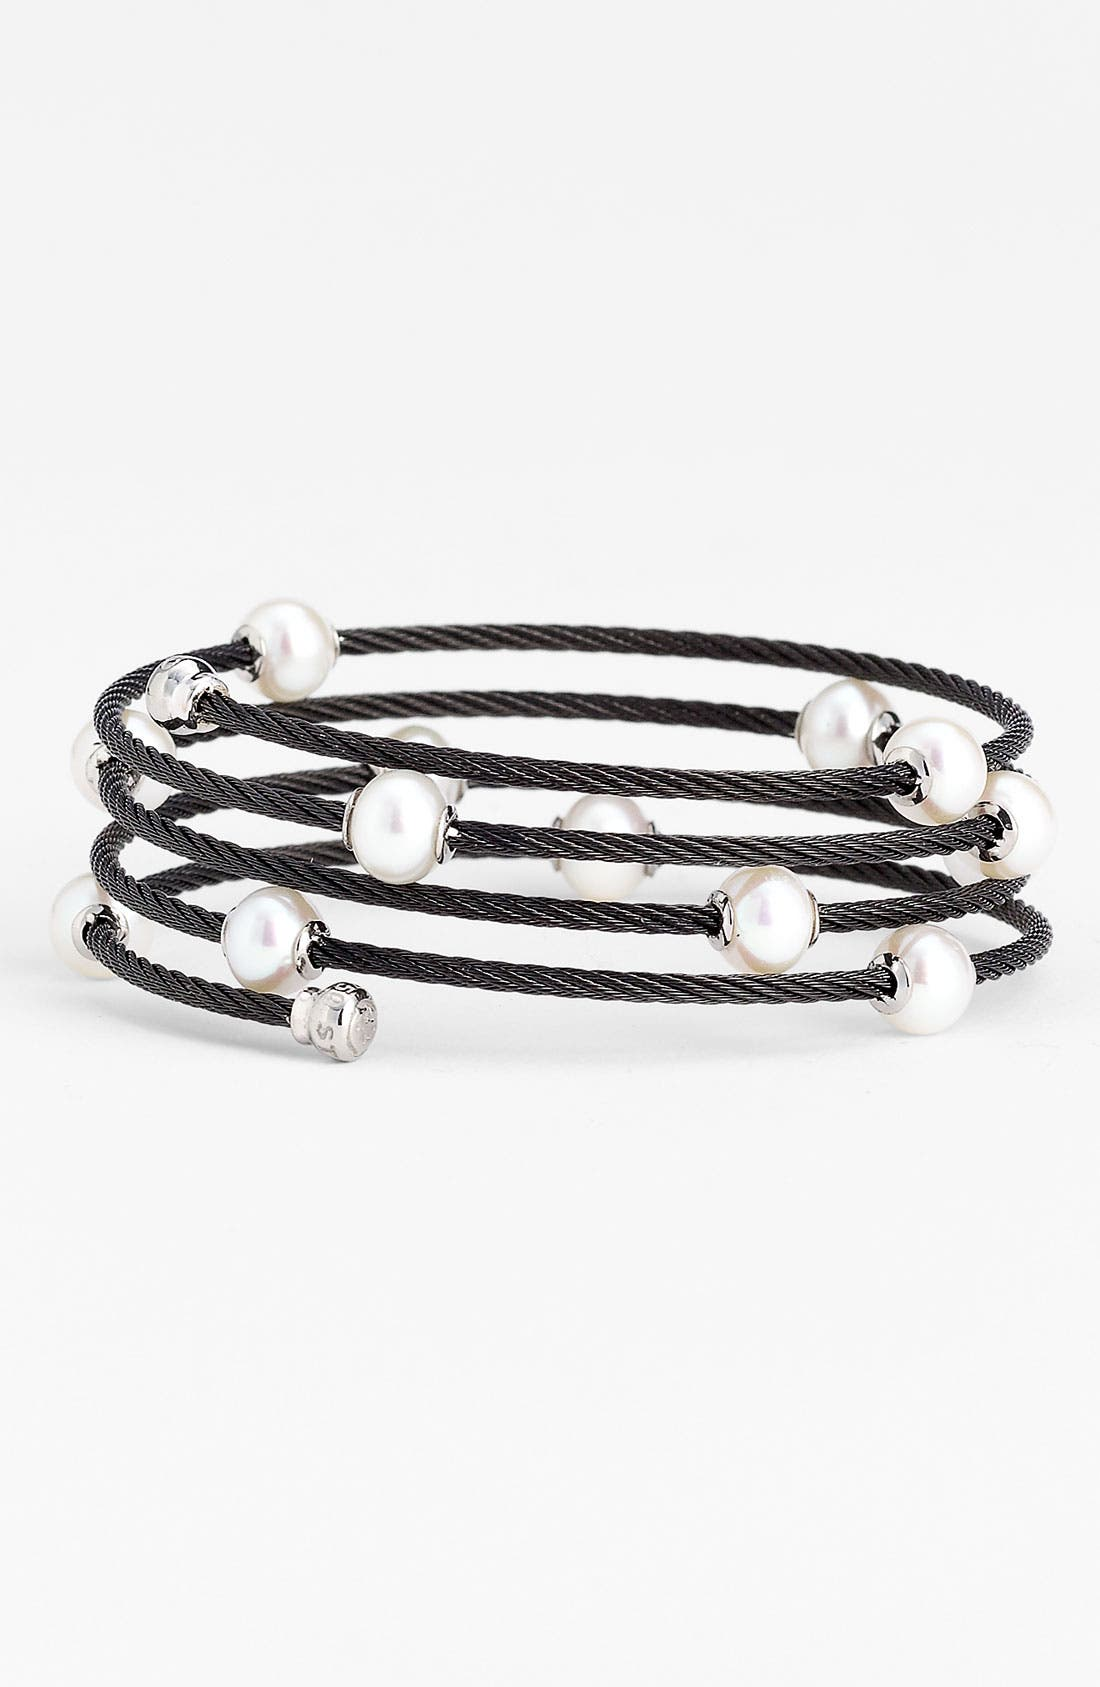 Alternate Image 1 Selected - ALOR® Pearl Cable Bracelet